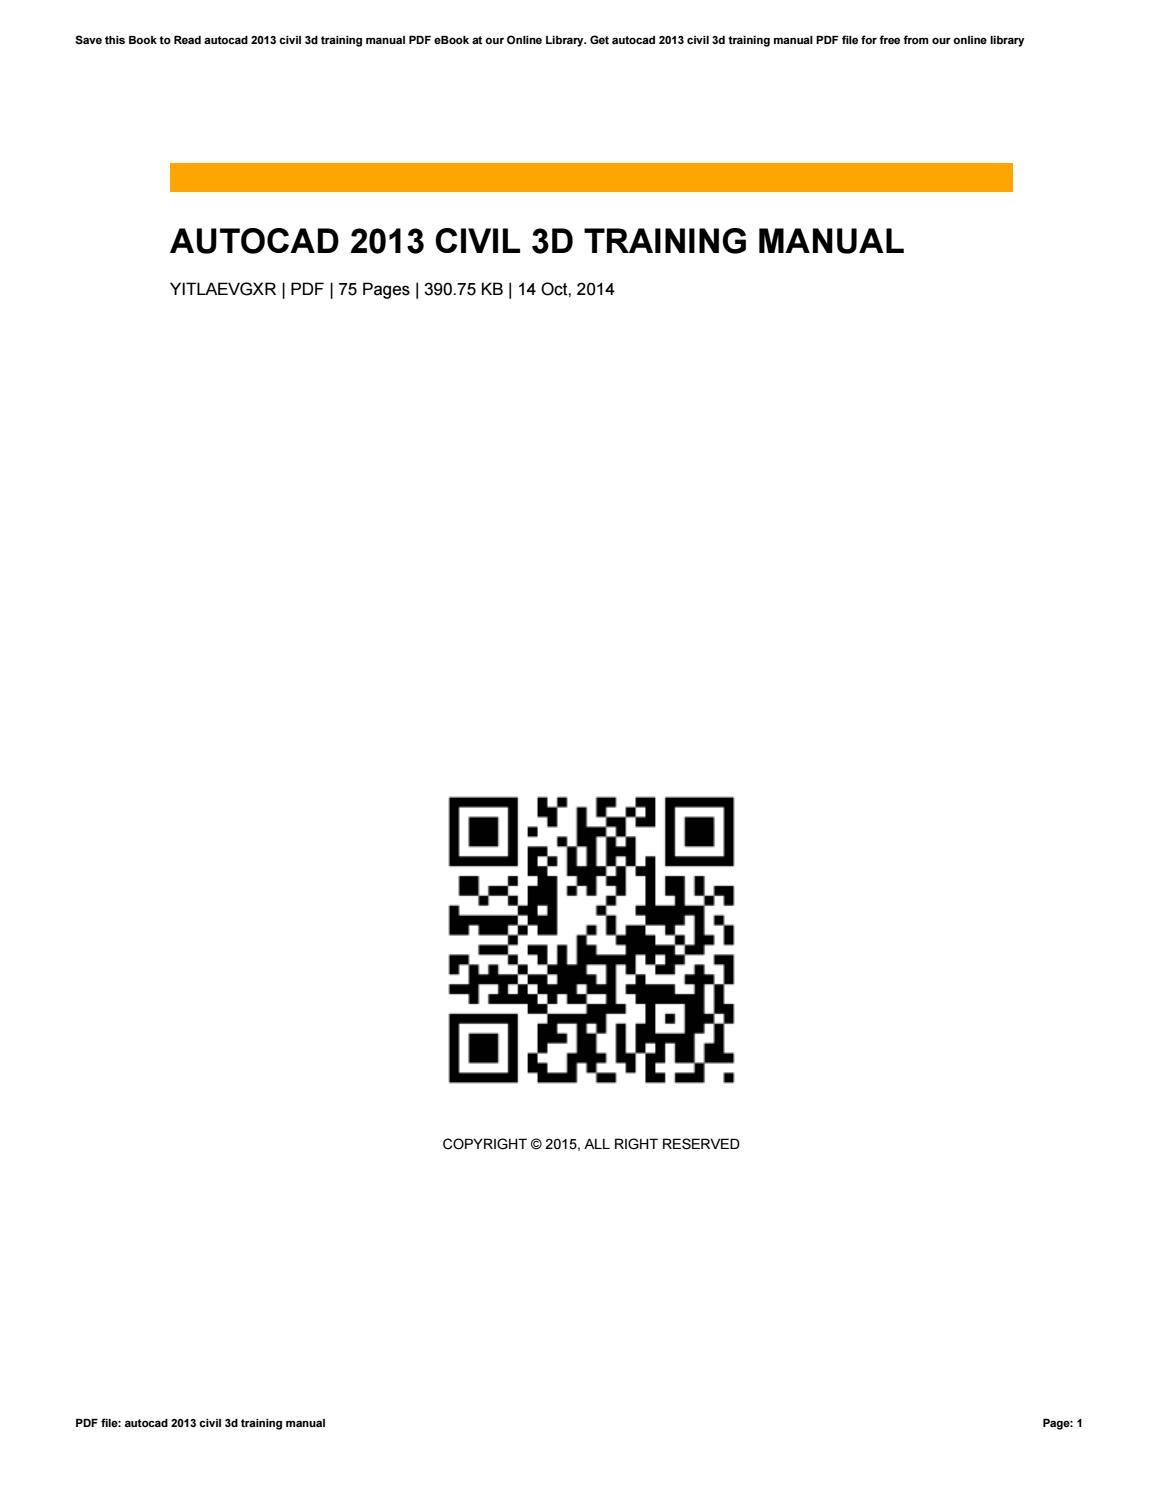 Autocad 3D Training Manual